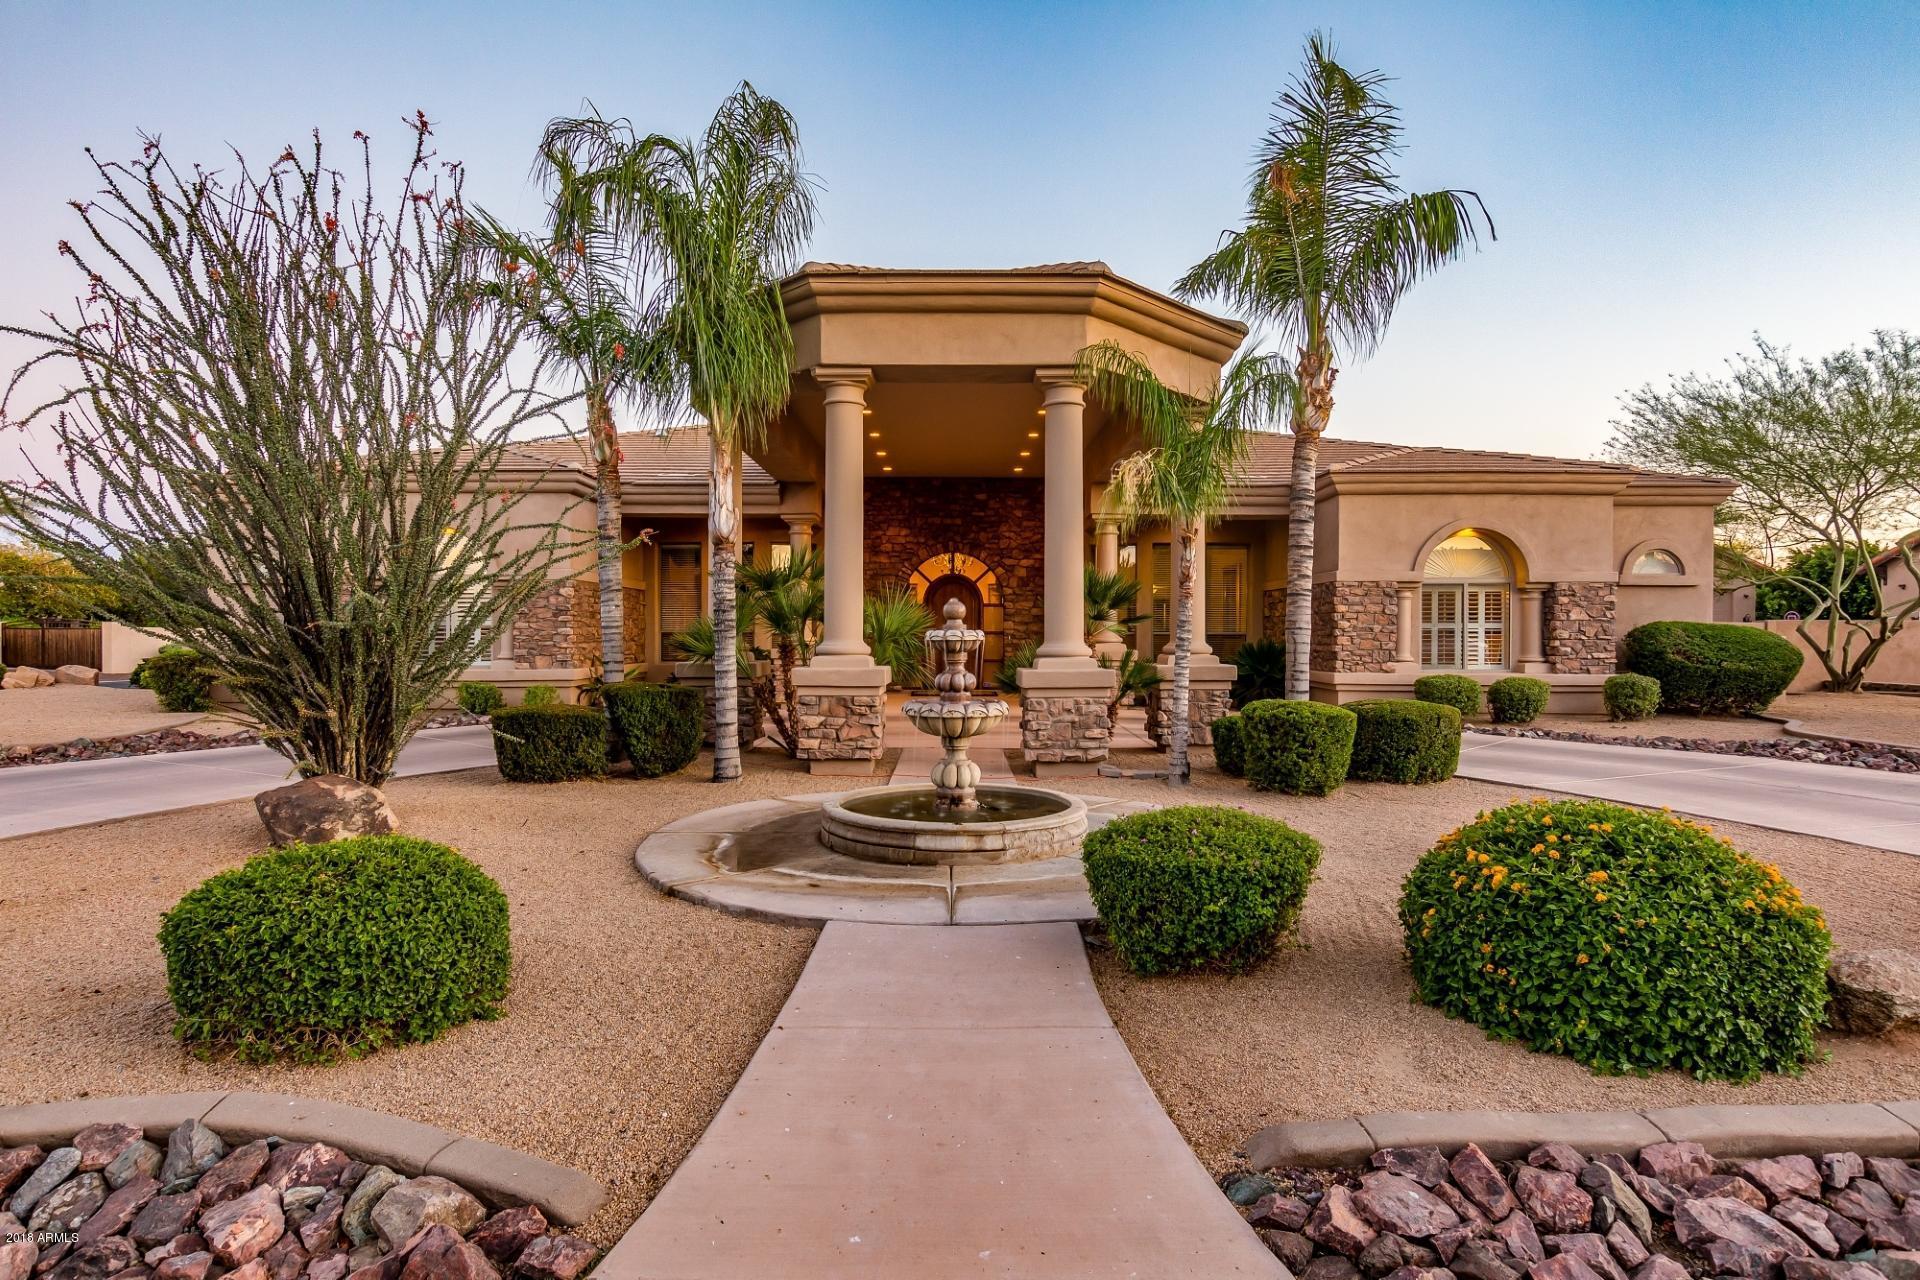 9125 W MONTANA DE ORO Drive, Peoria, Arizona